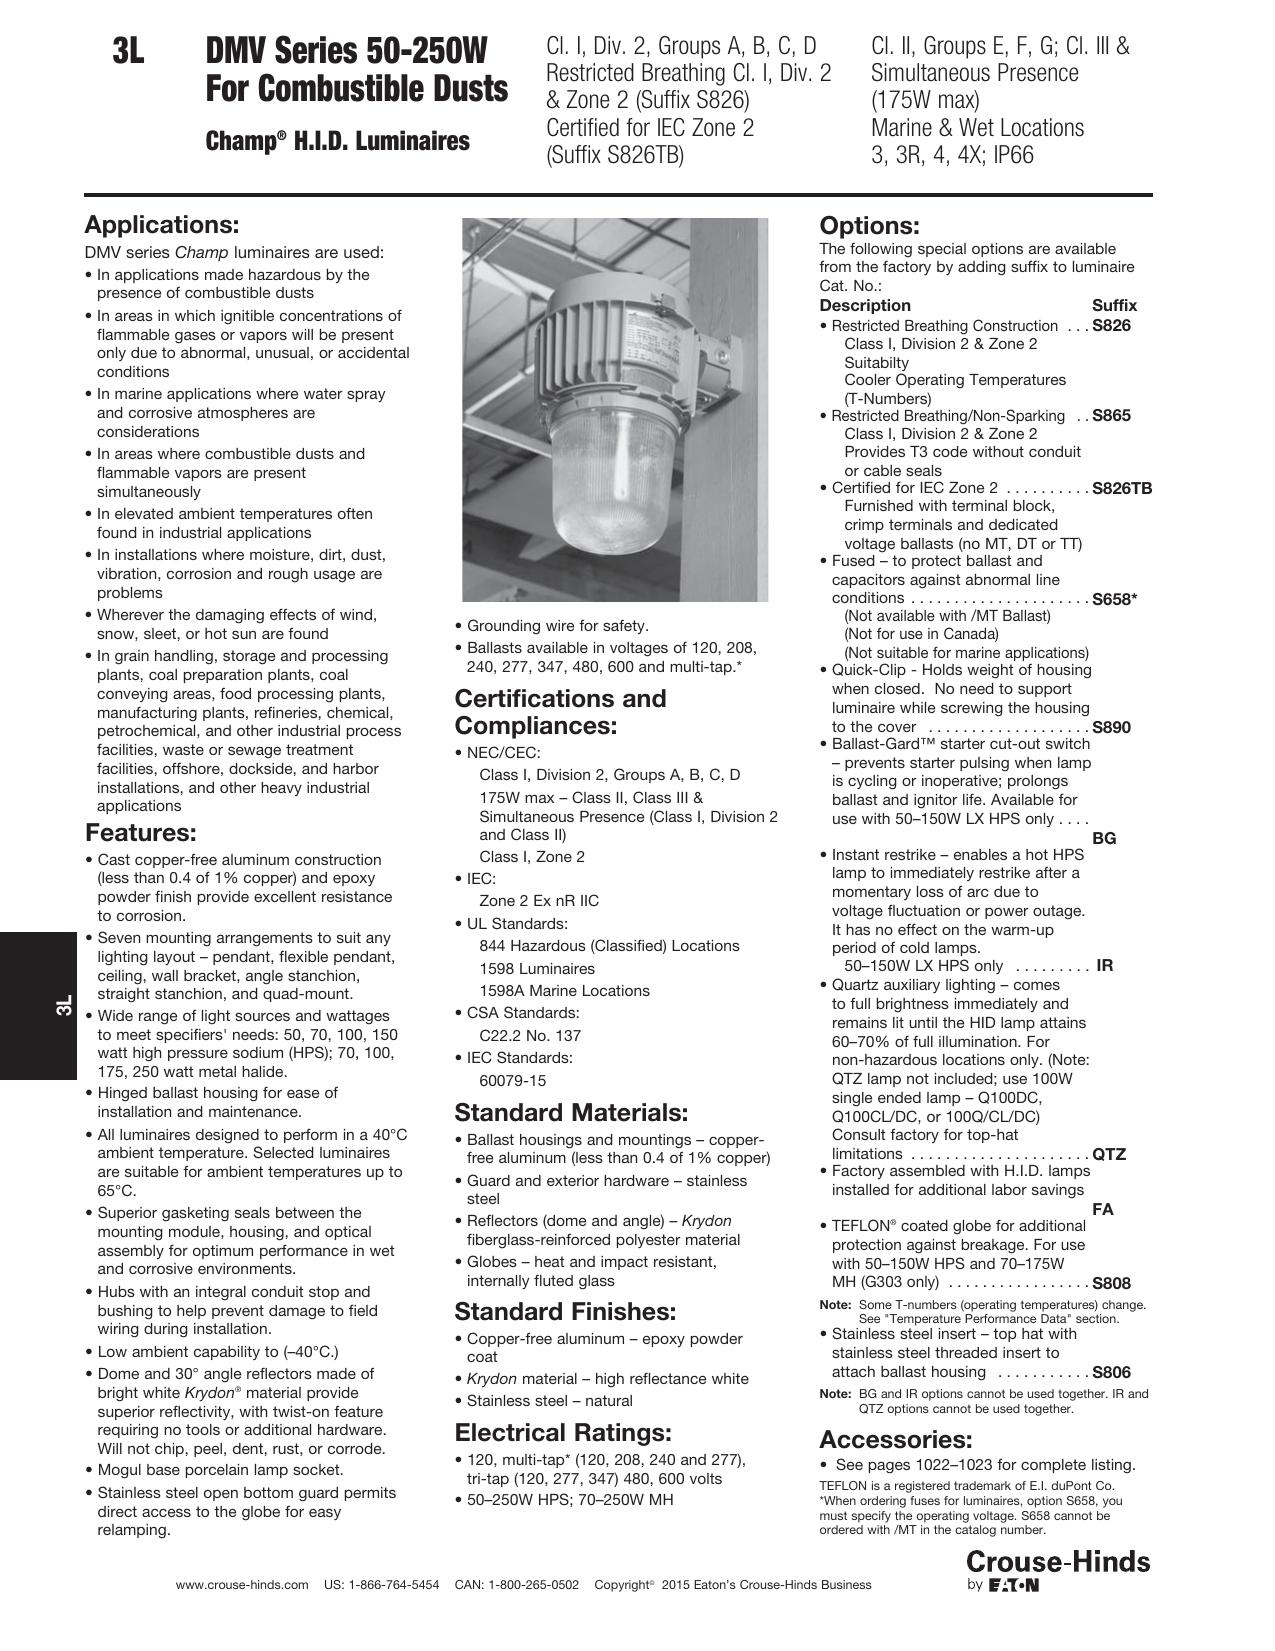 Wiring Diagram Additionally Multitap Hid Ballast Wiring Diagram